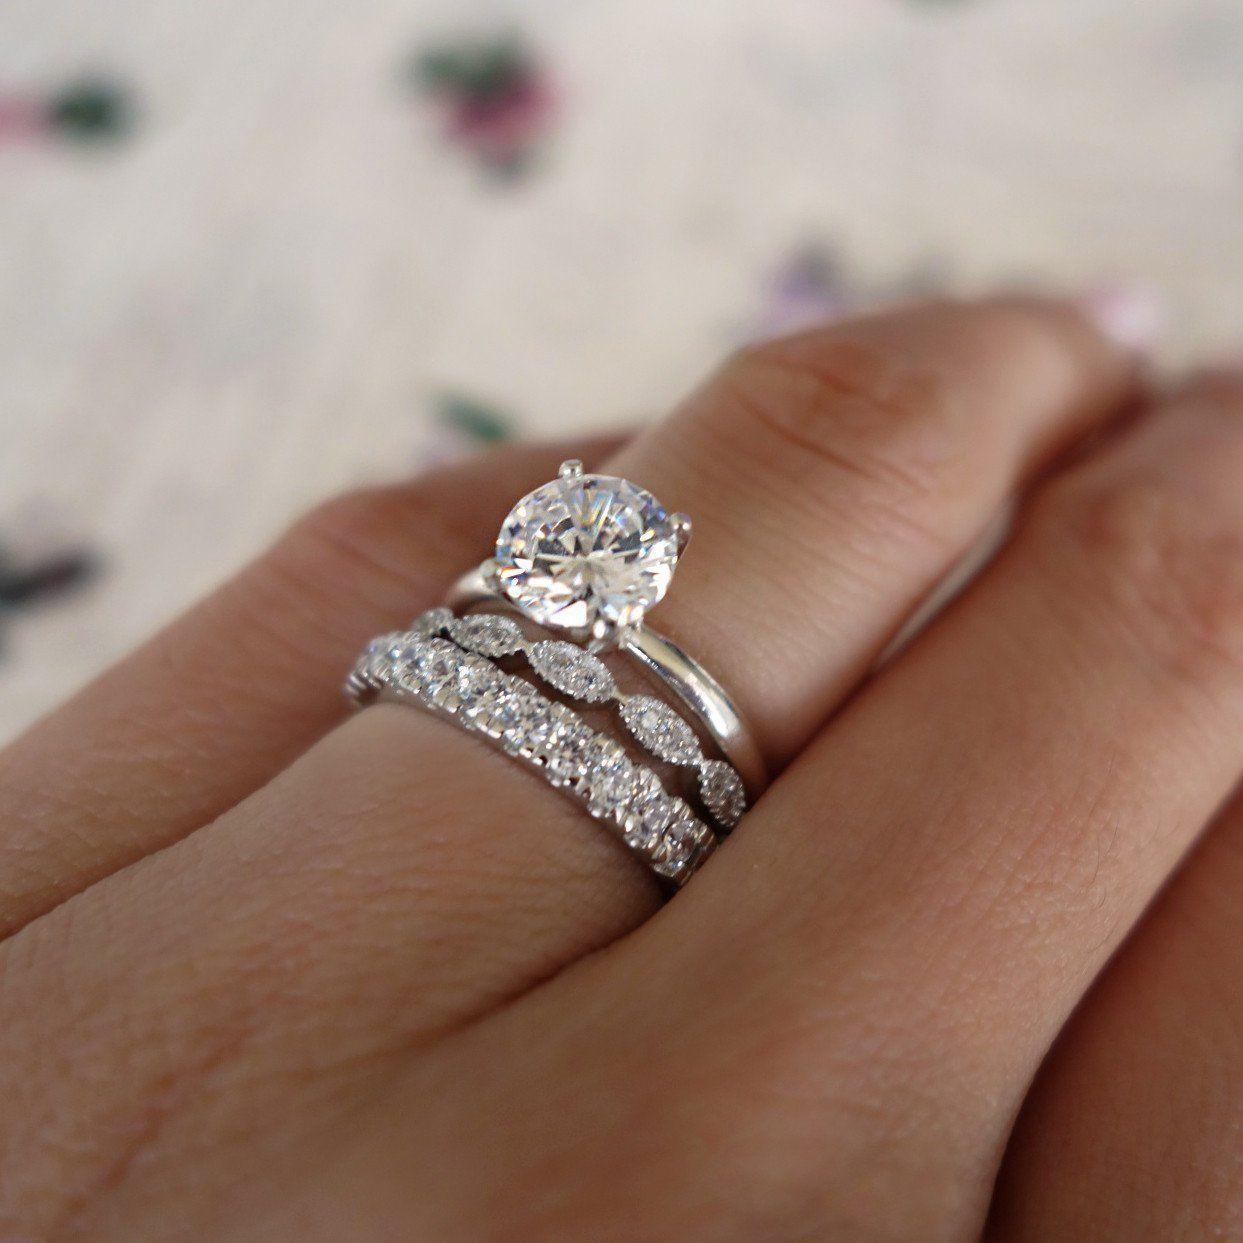 2 29 3pcs 10kt White Gold Filled White Sapphire Ring Set Women Wedding Jewelry Sz6 10 Ebay Fashion Big Wedding Rings Cool Wedding Rings Bridal Rings